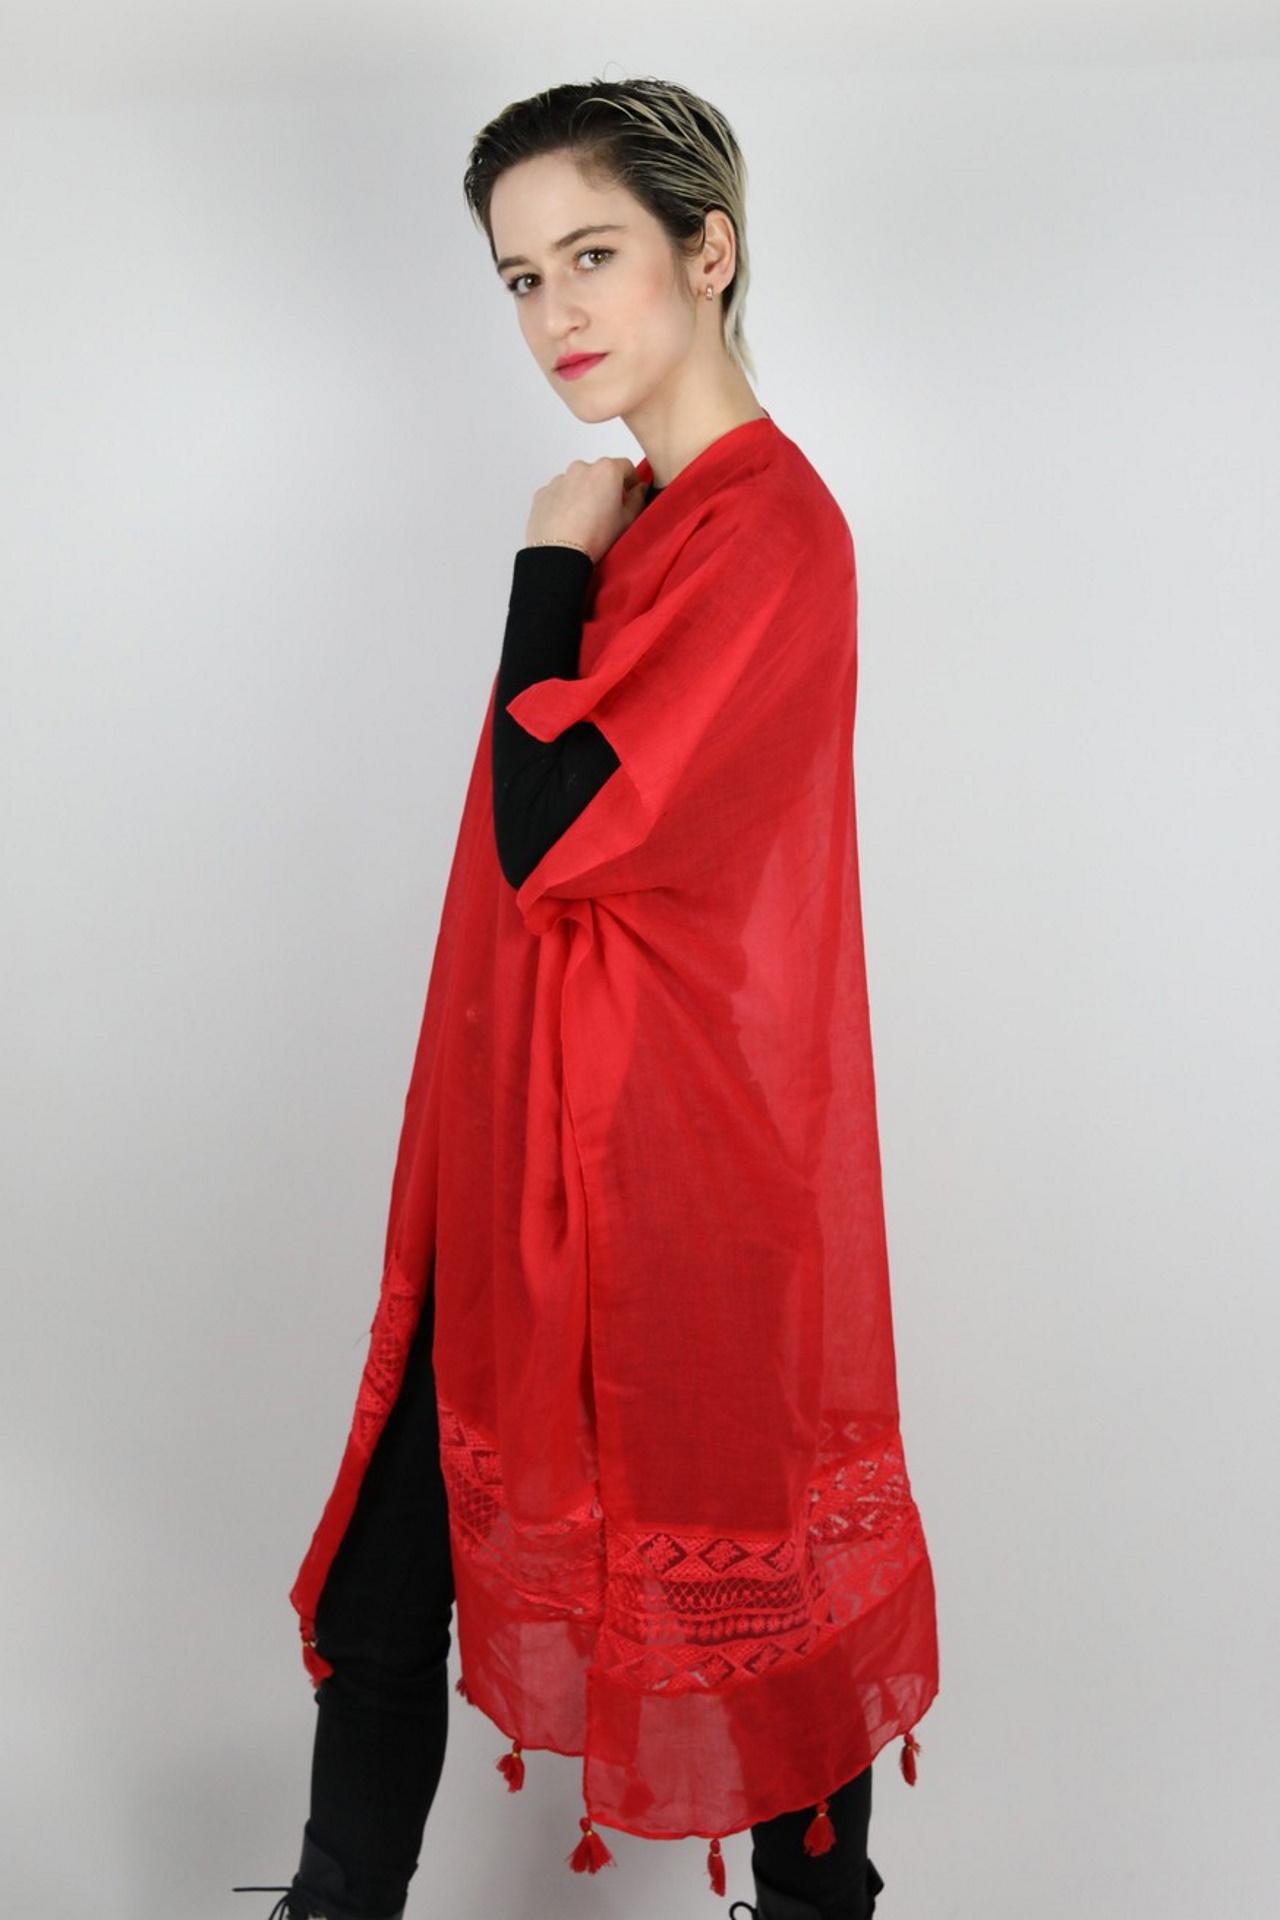 CLOTHES179 STOLA DONNA FOULARD CARDIGAN COPRISPALLE 2 1stAmerican elegante stola da donna foulard cardigan coprispalle